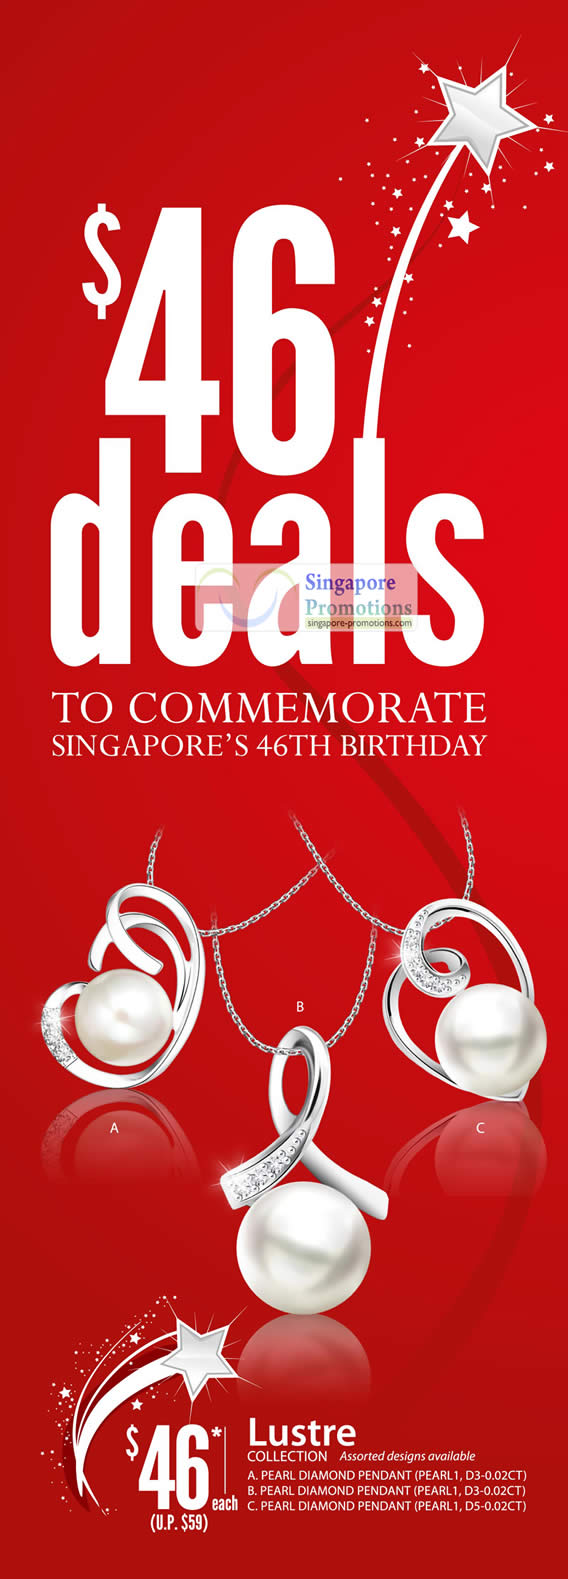 46 Dollar Deals, Lustre Collection Pearl Diamond Pendant